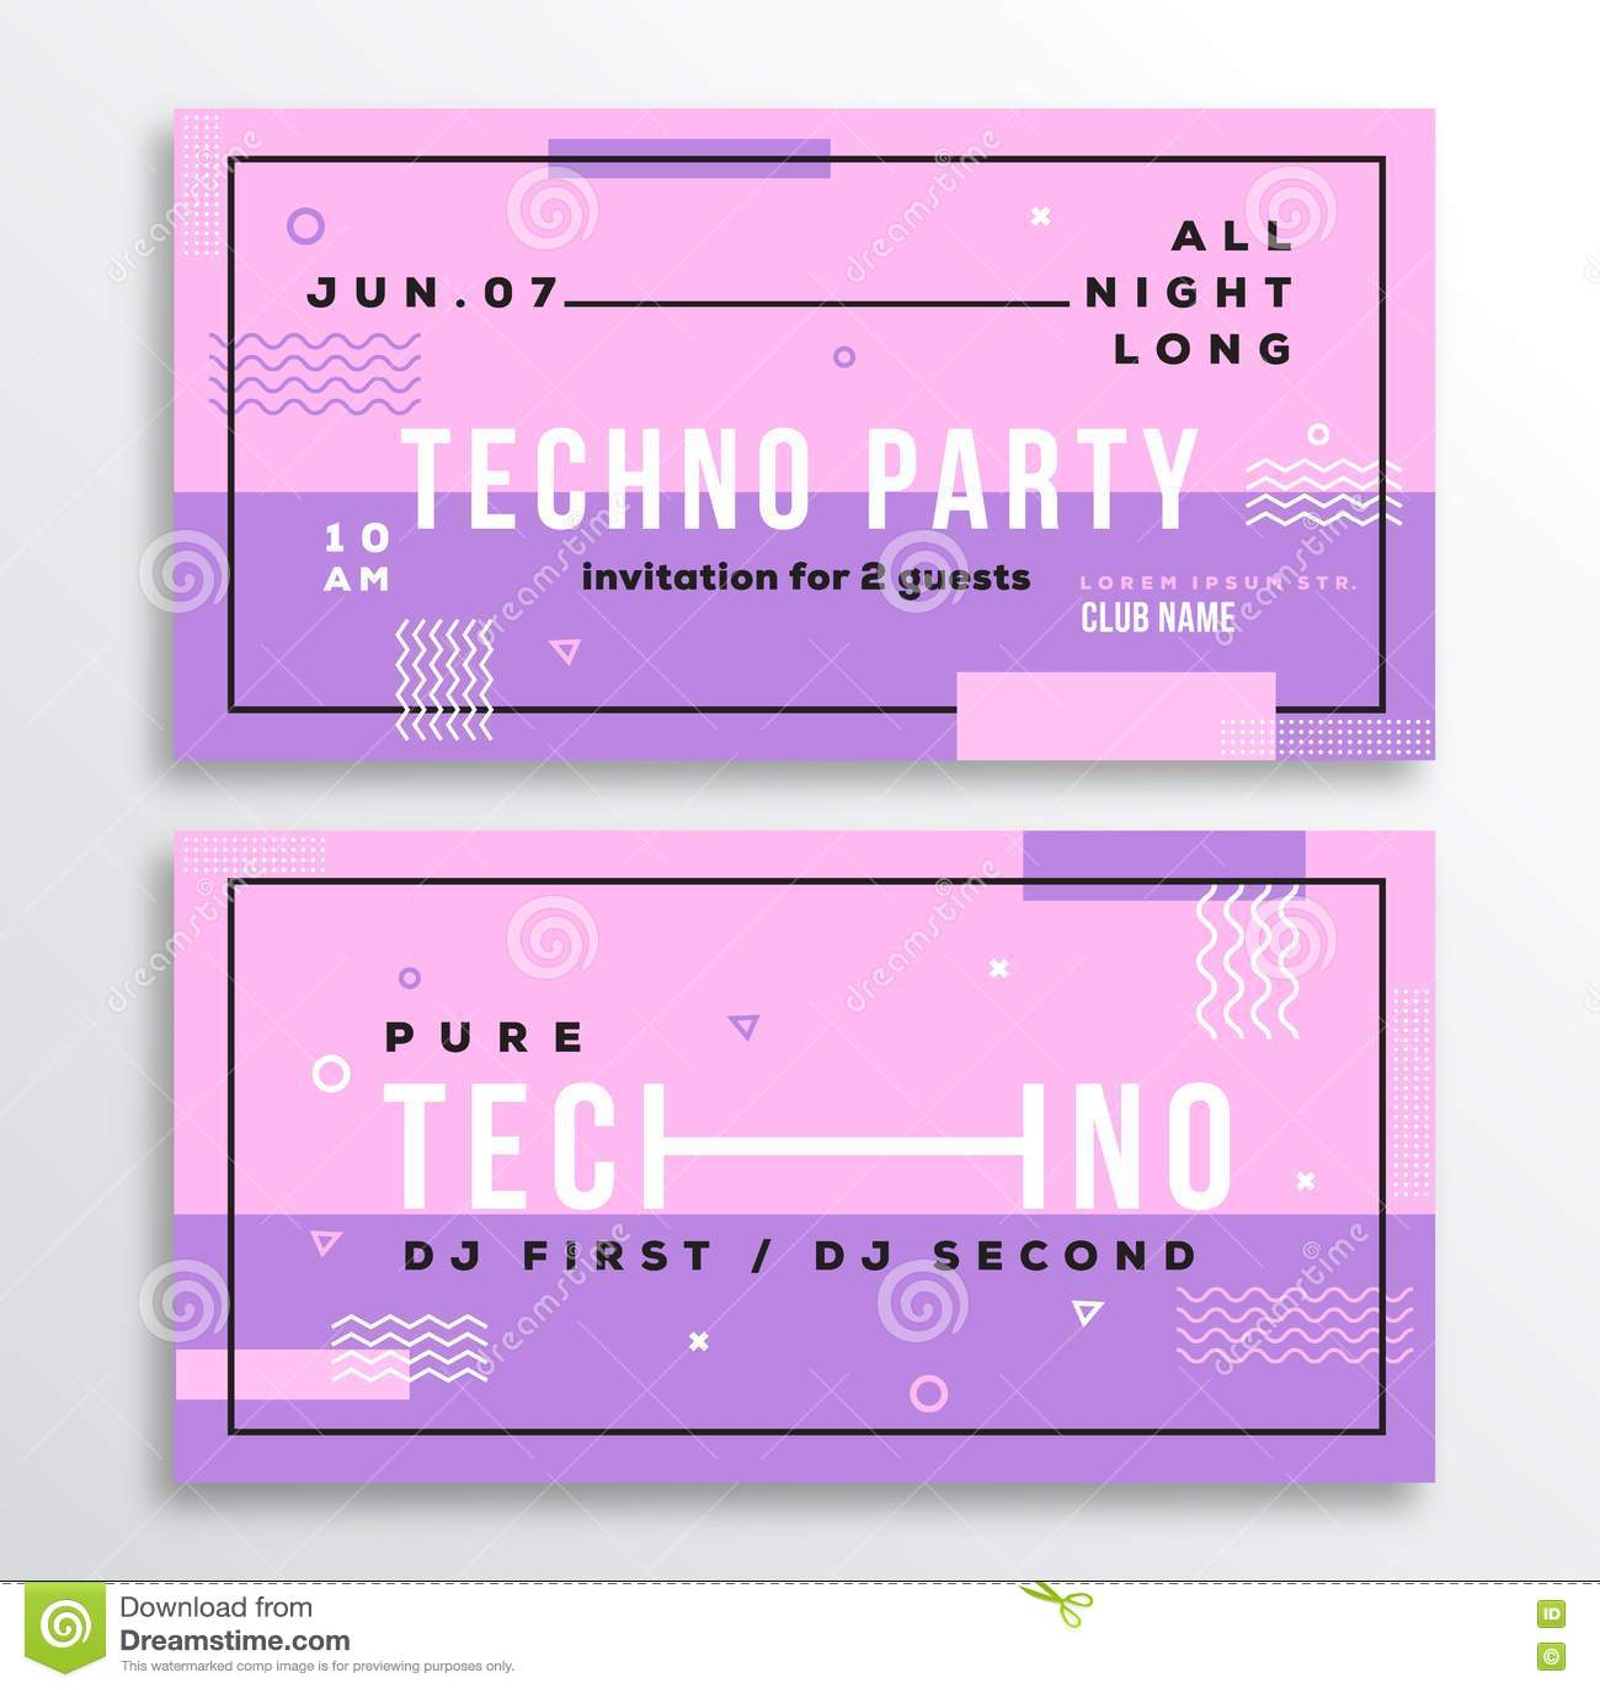 night techno party club invitation card or flyer template stock night techno party club invitation card or flyer template